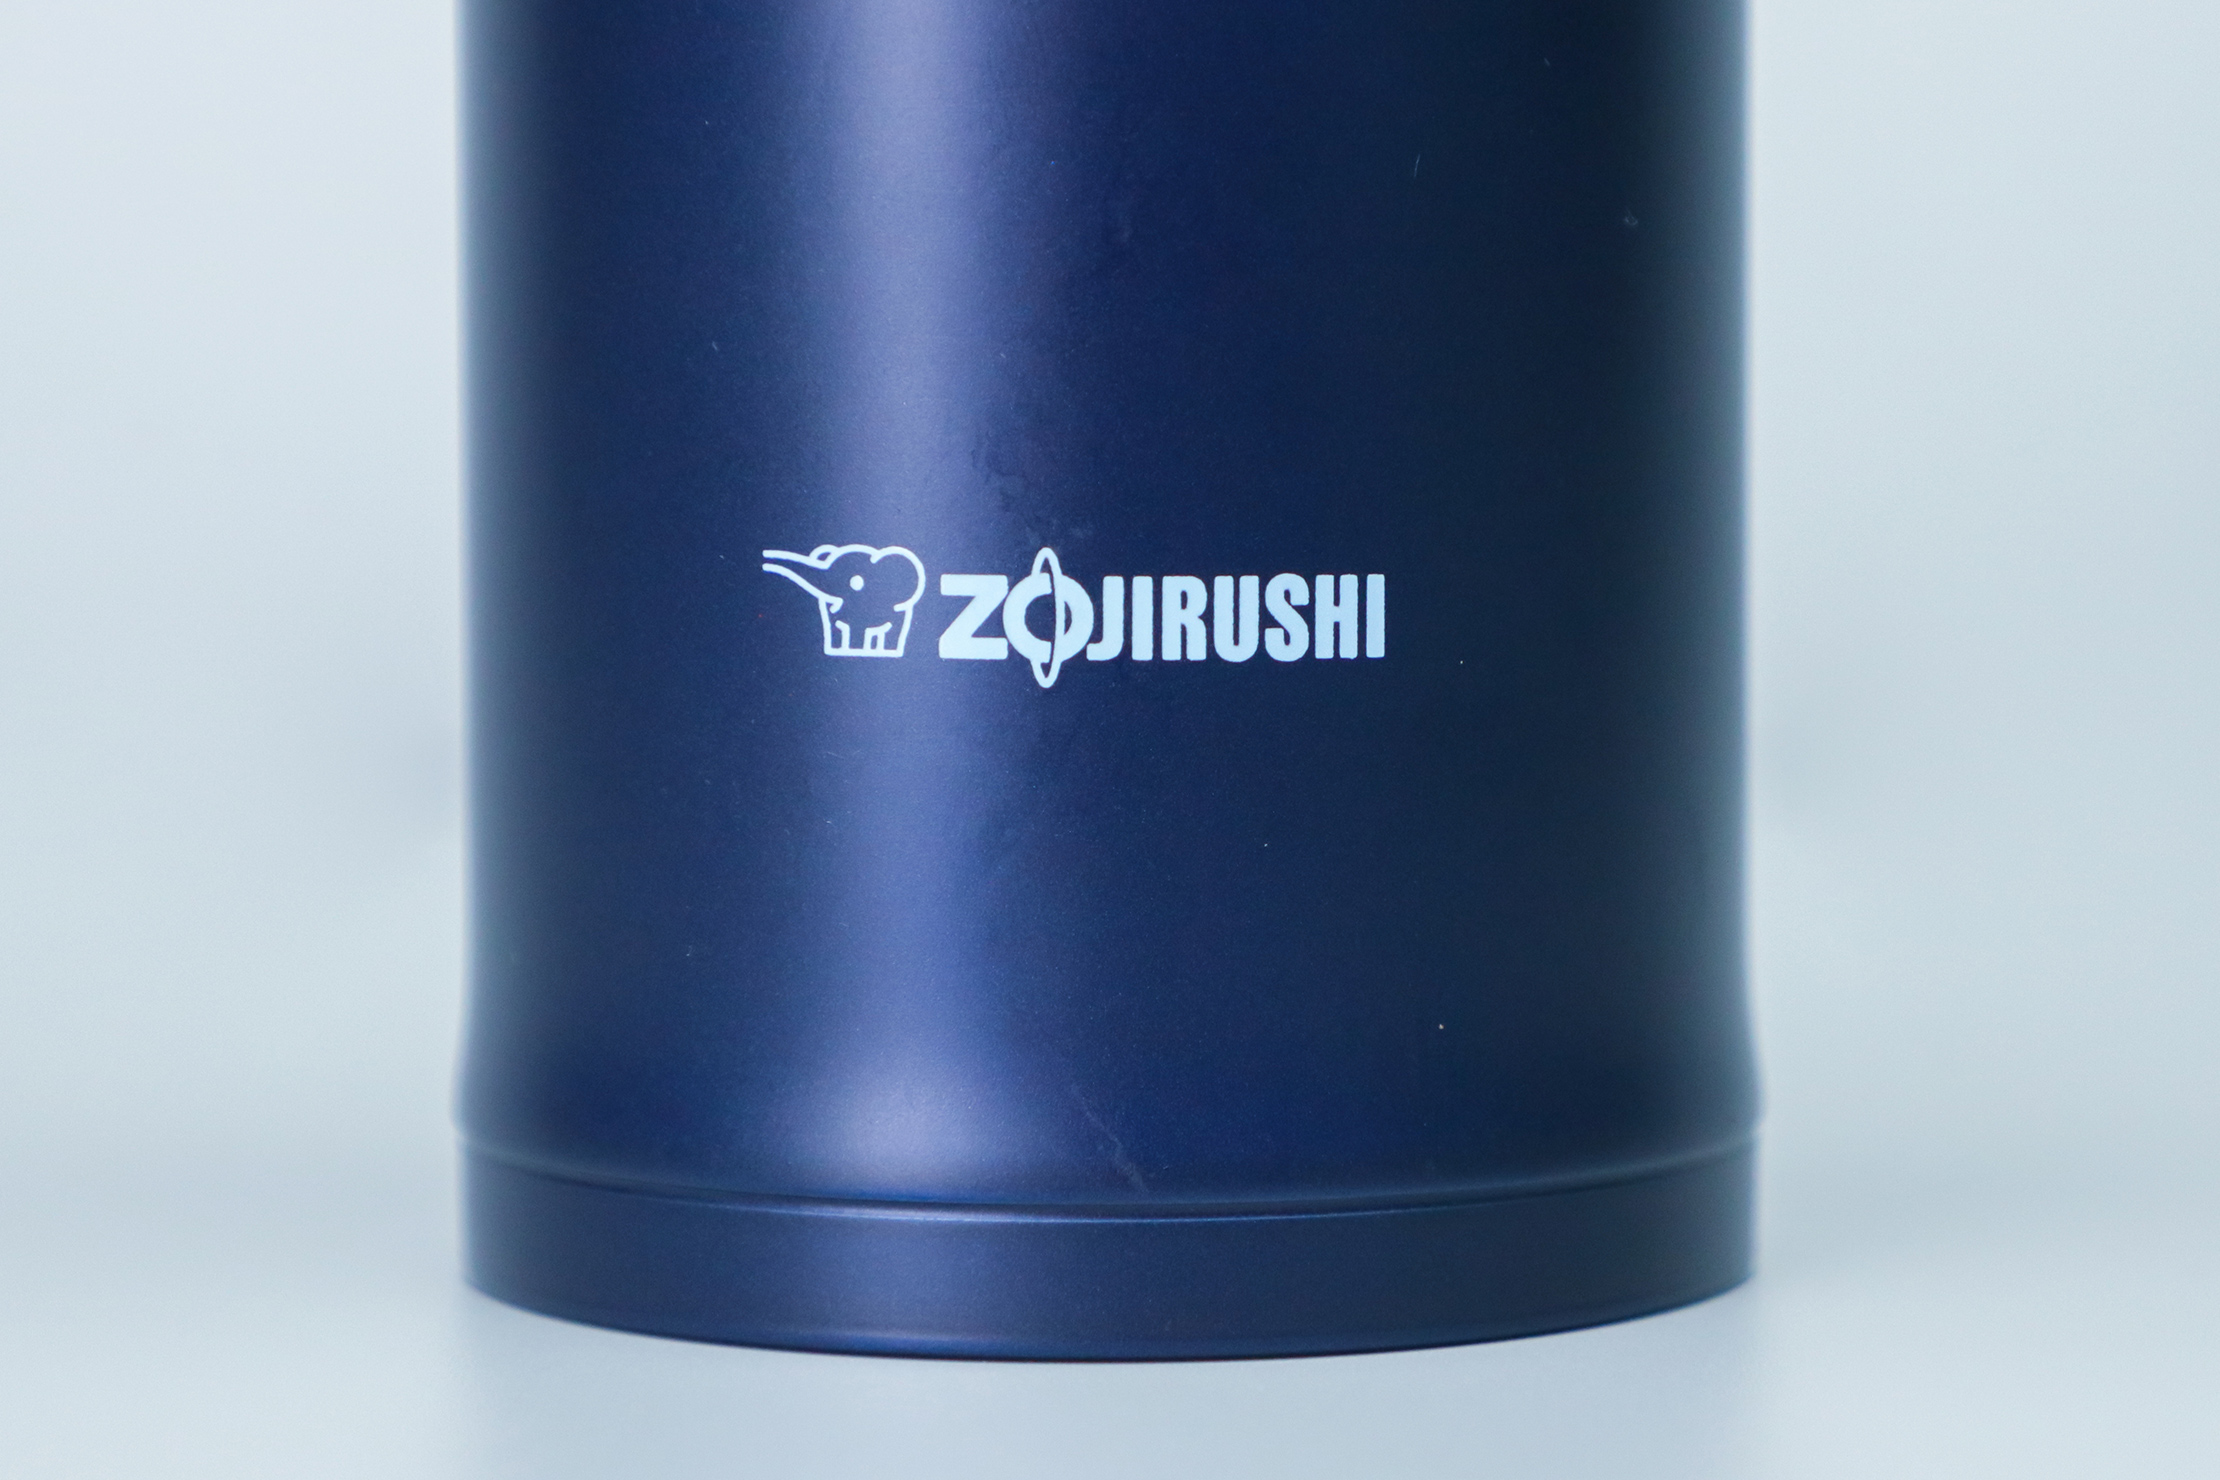 Zojirushi Cool Bottle Logo